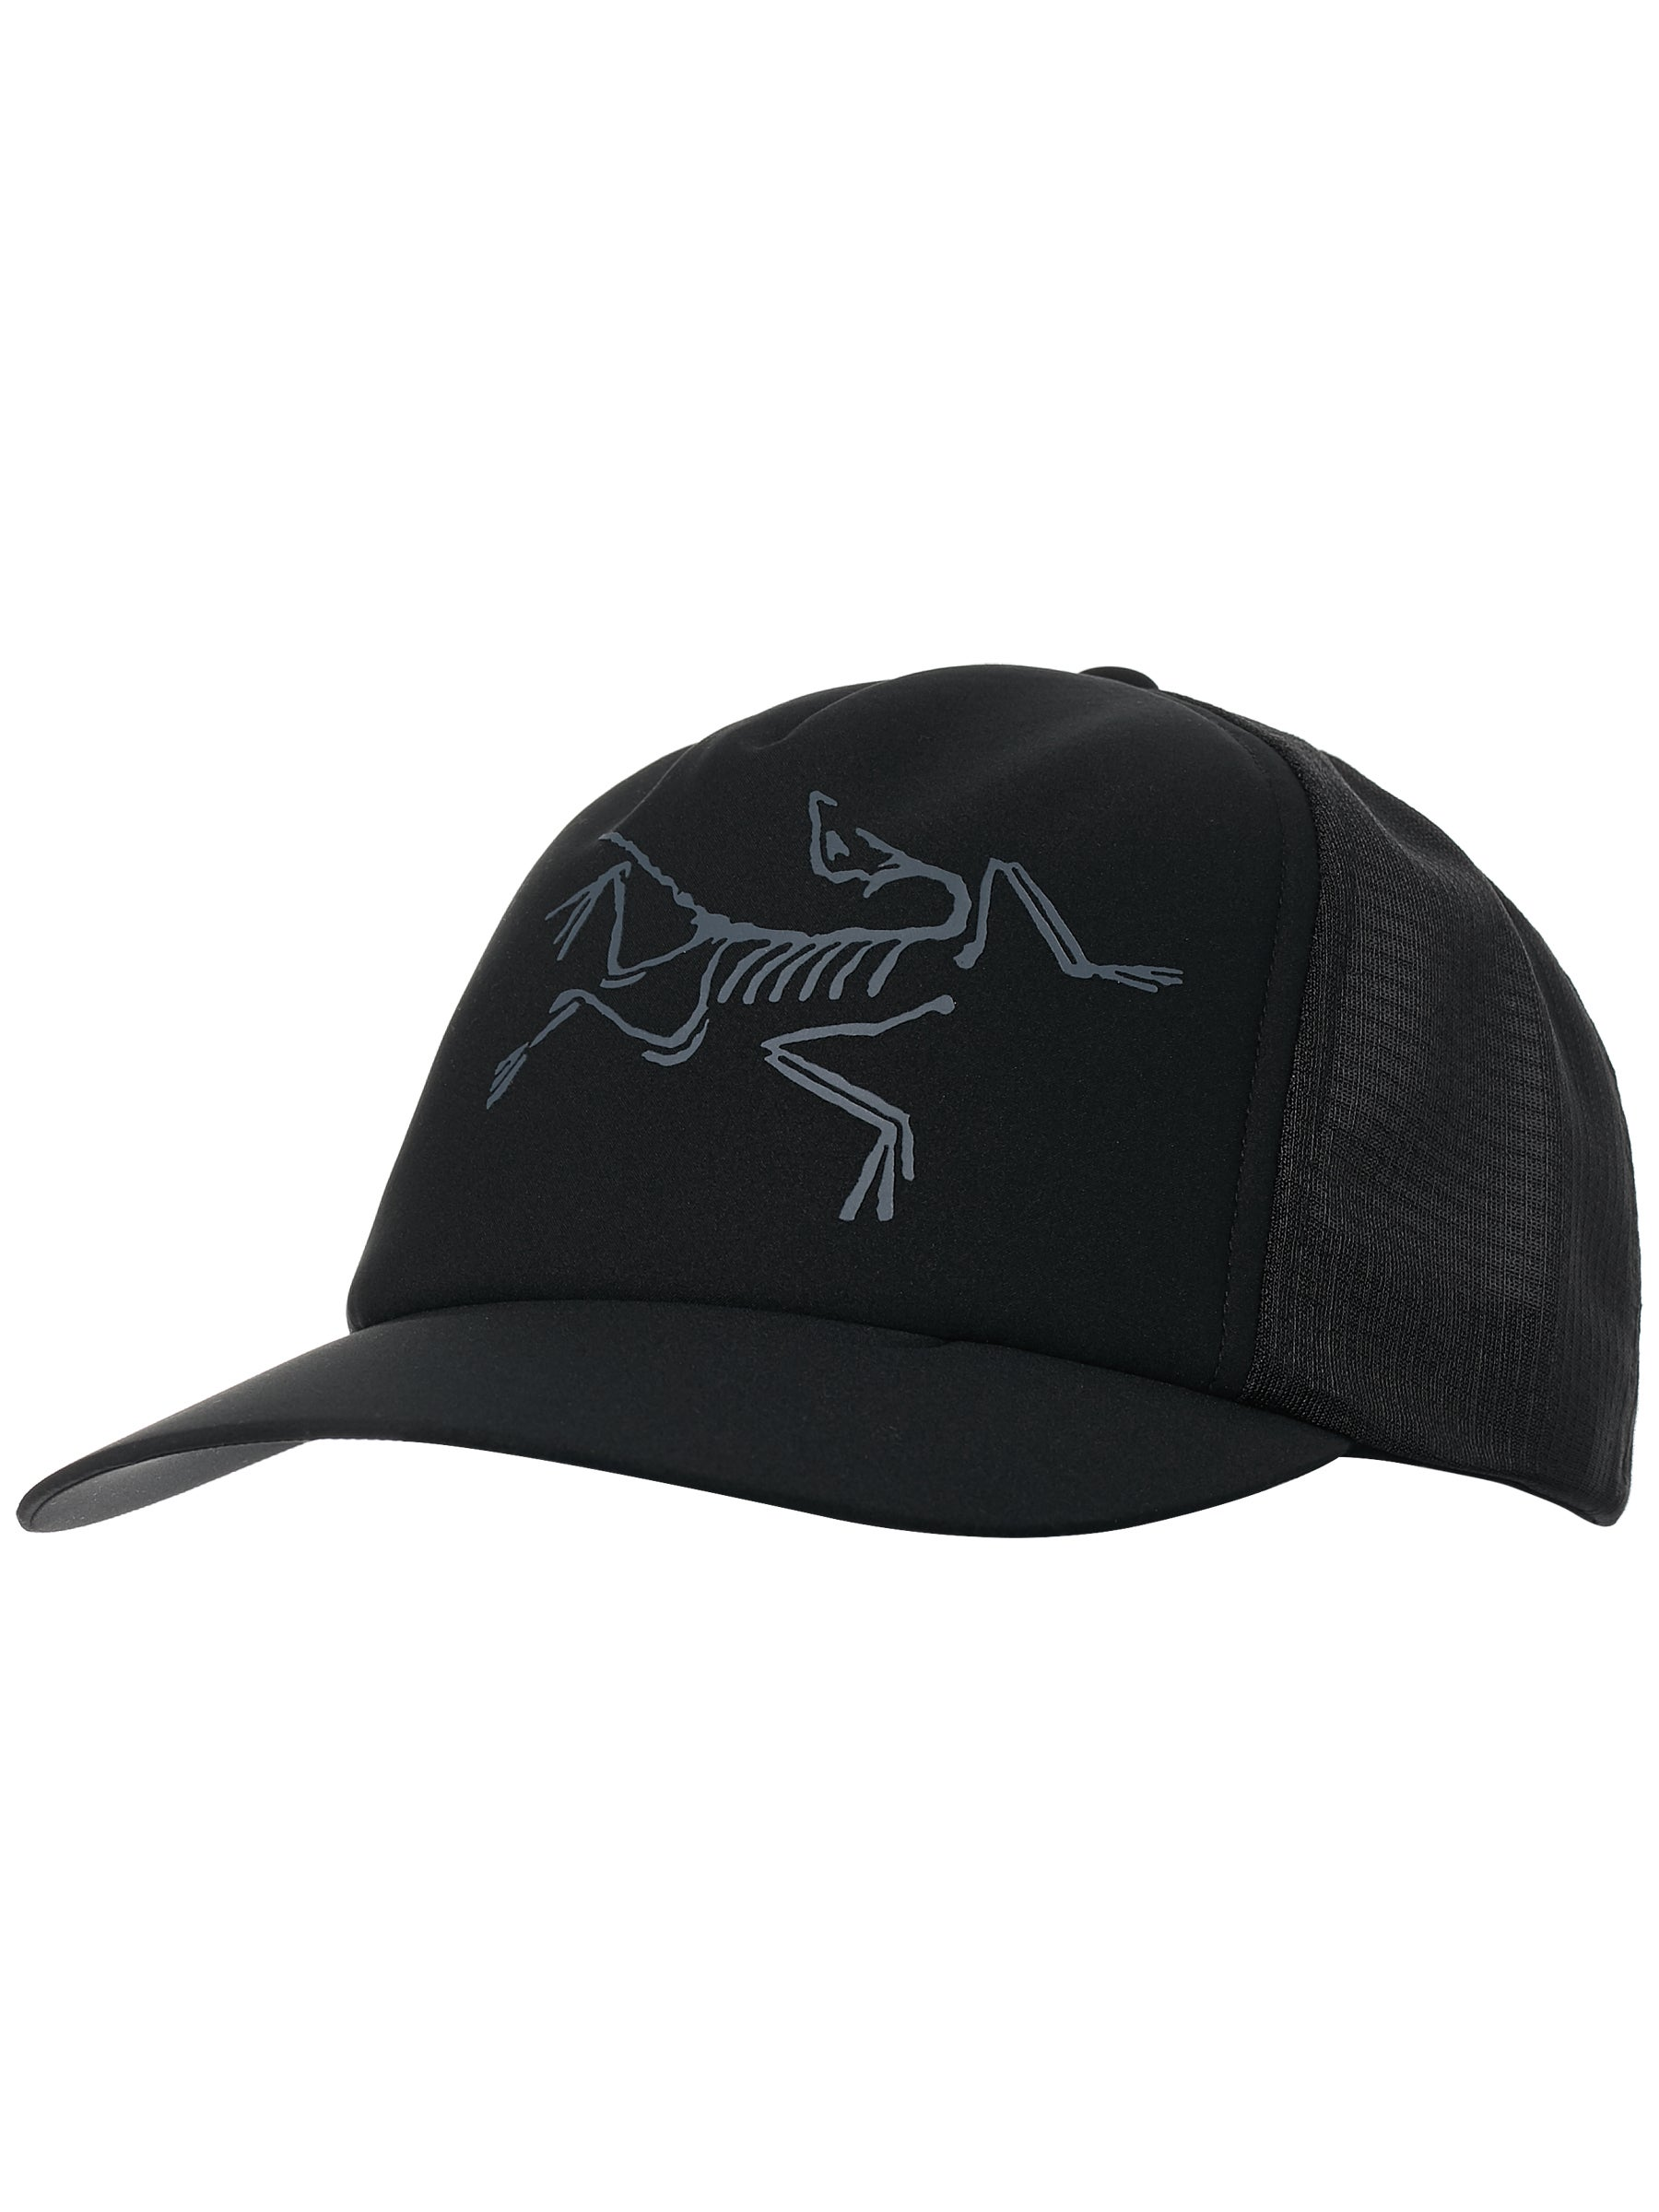 Arcteryx Bird Trucker Hat Cap